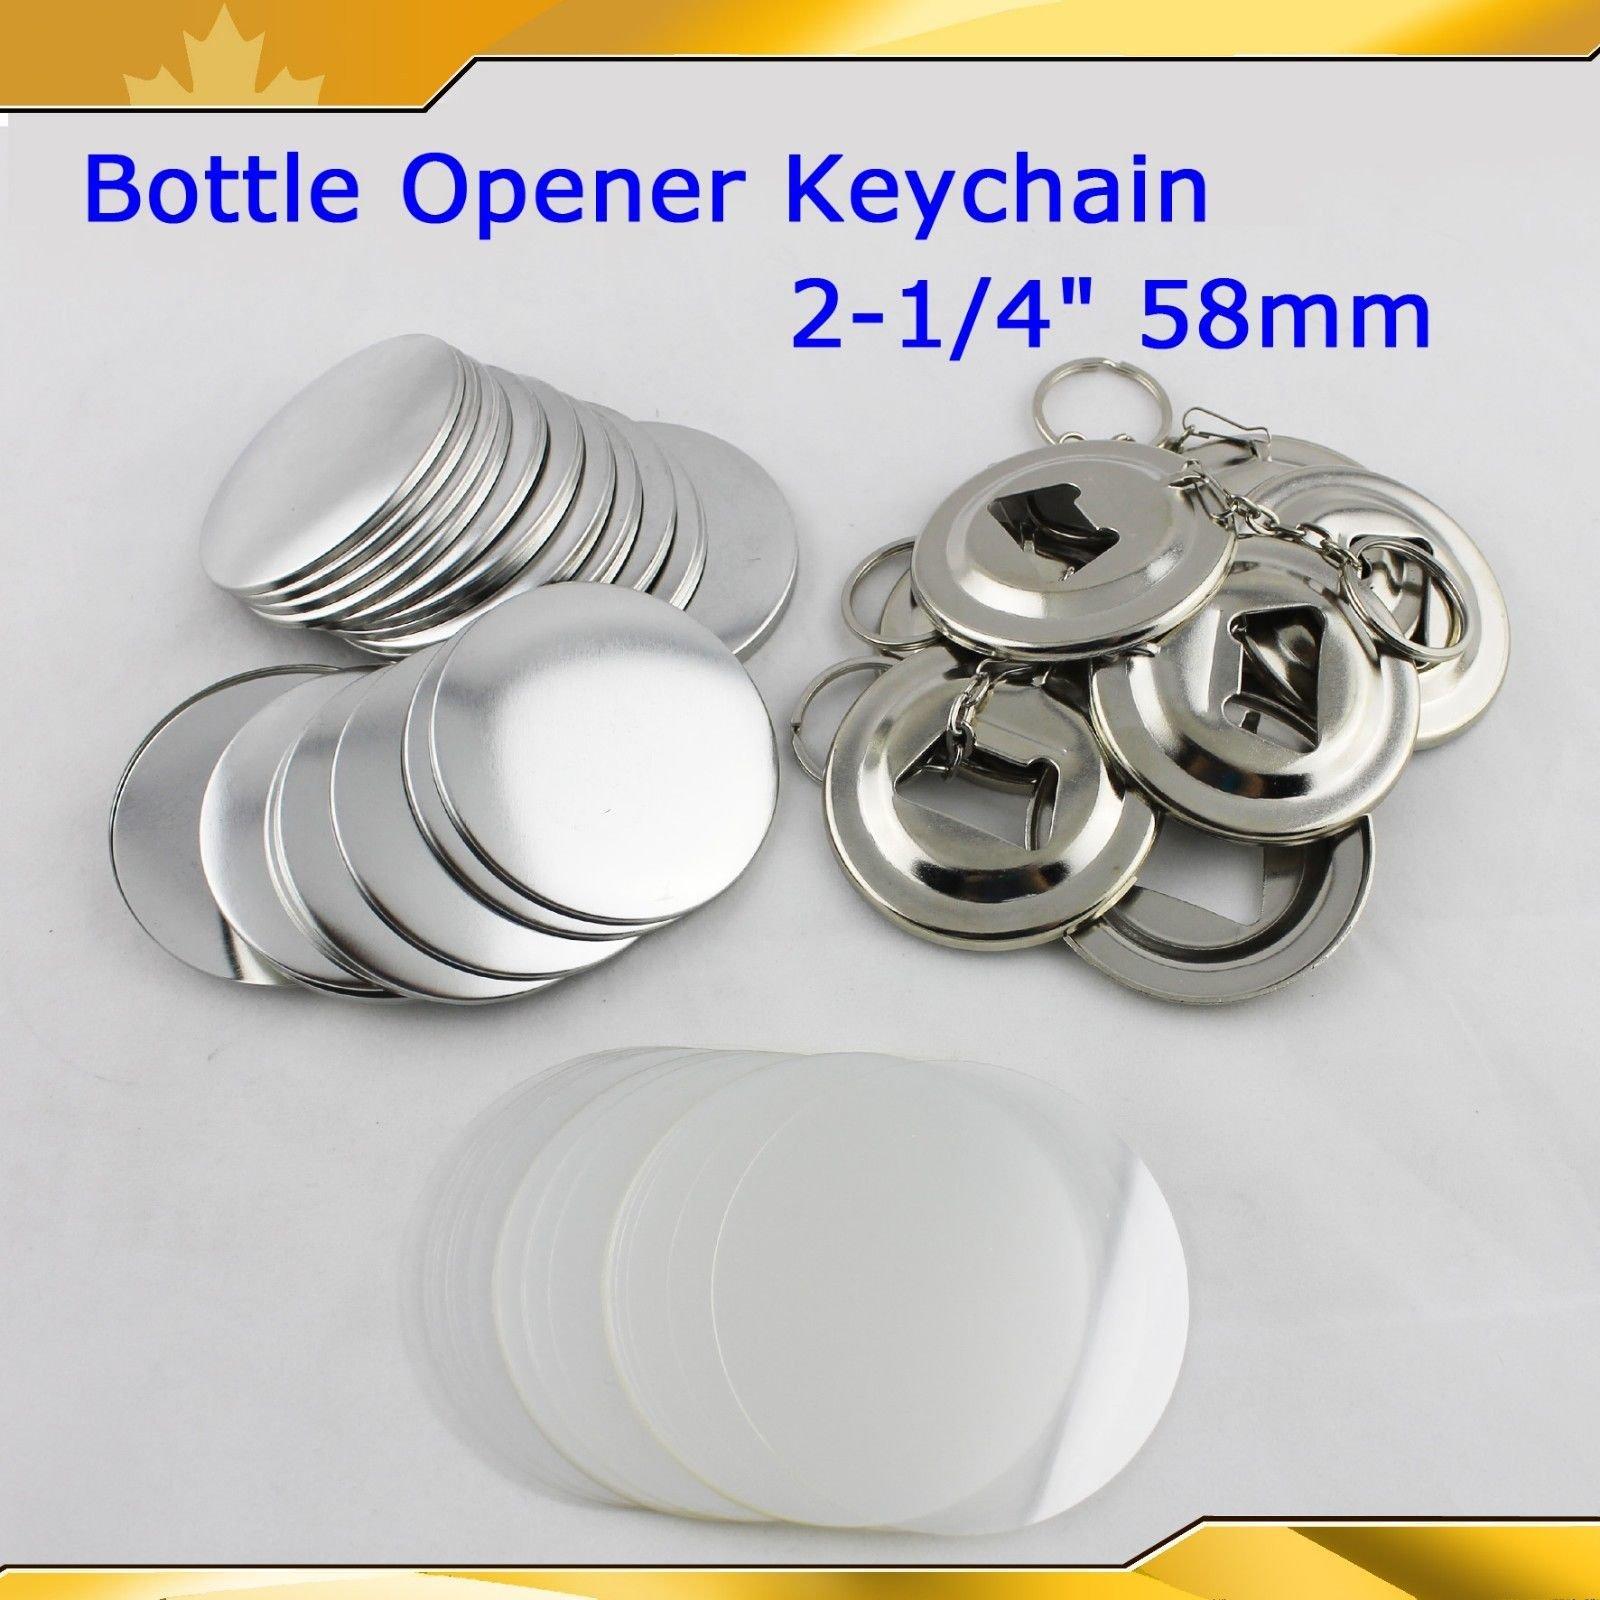 Bottle Opener Keychain 58mm 2-1/4'' Parts 100set Supplies for Pro Maker Machine